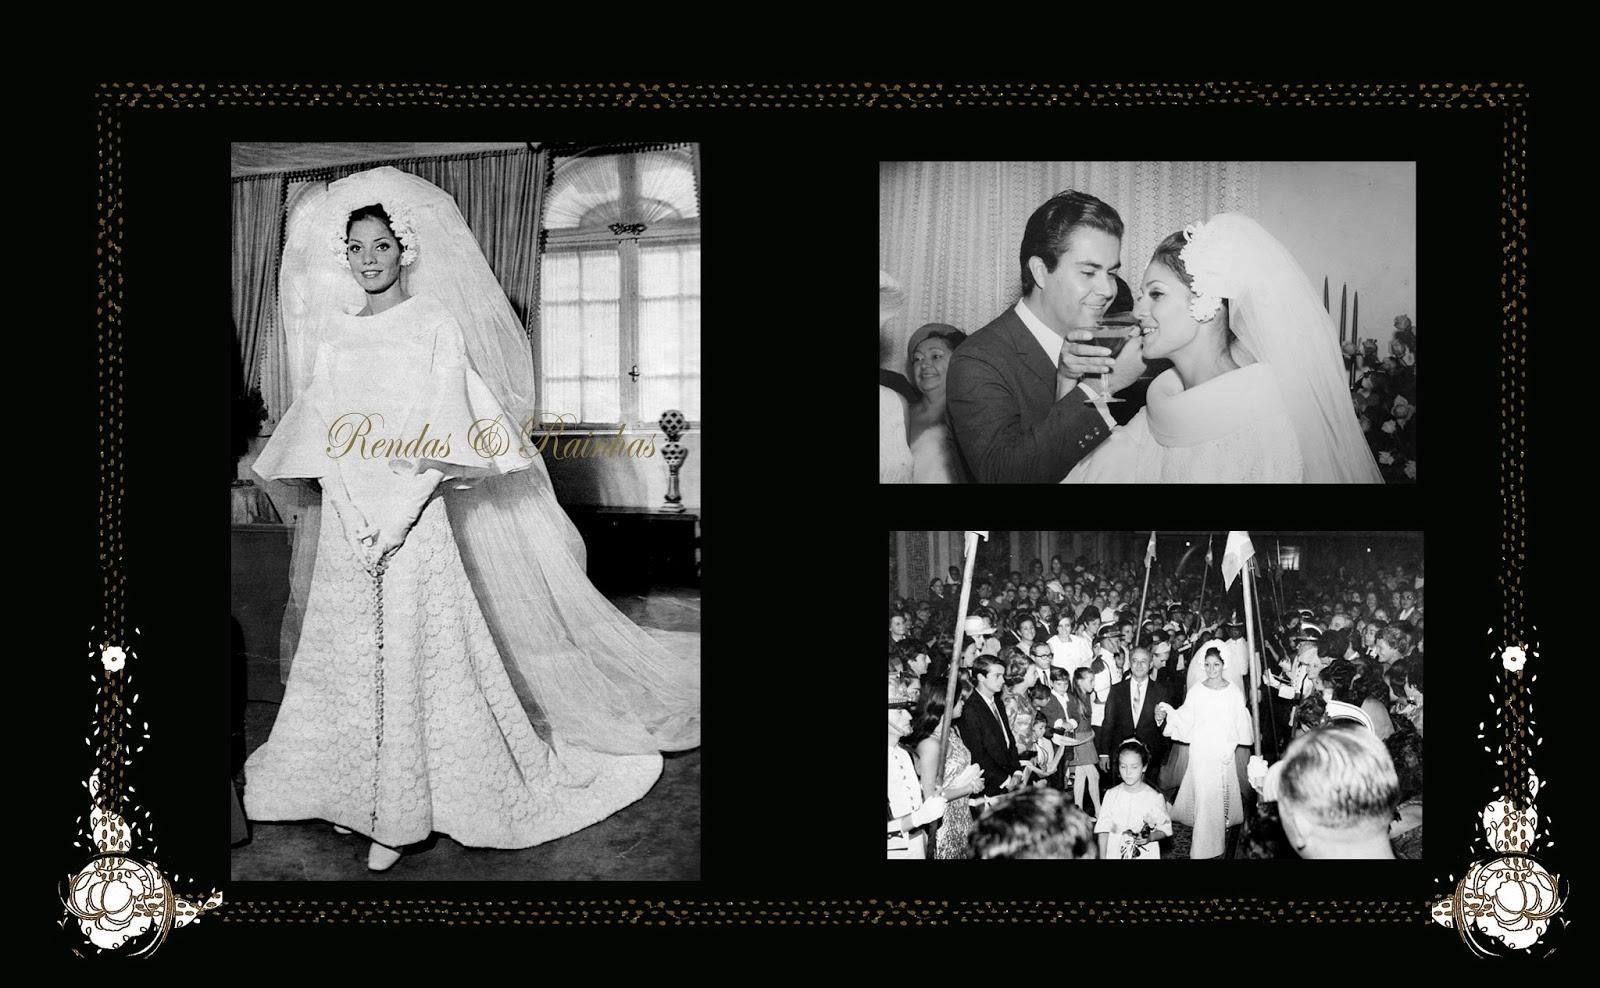 ✾◕‿◕✾ Galeria de Ieda Maria Vargas, Miss Universe 1963.✾◕‿◕✾ - Página 3 Dhwuwu3